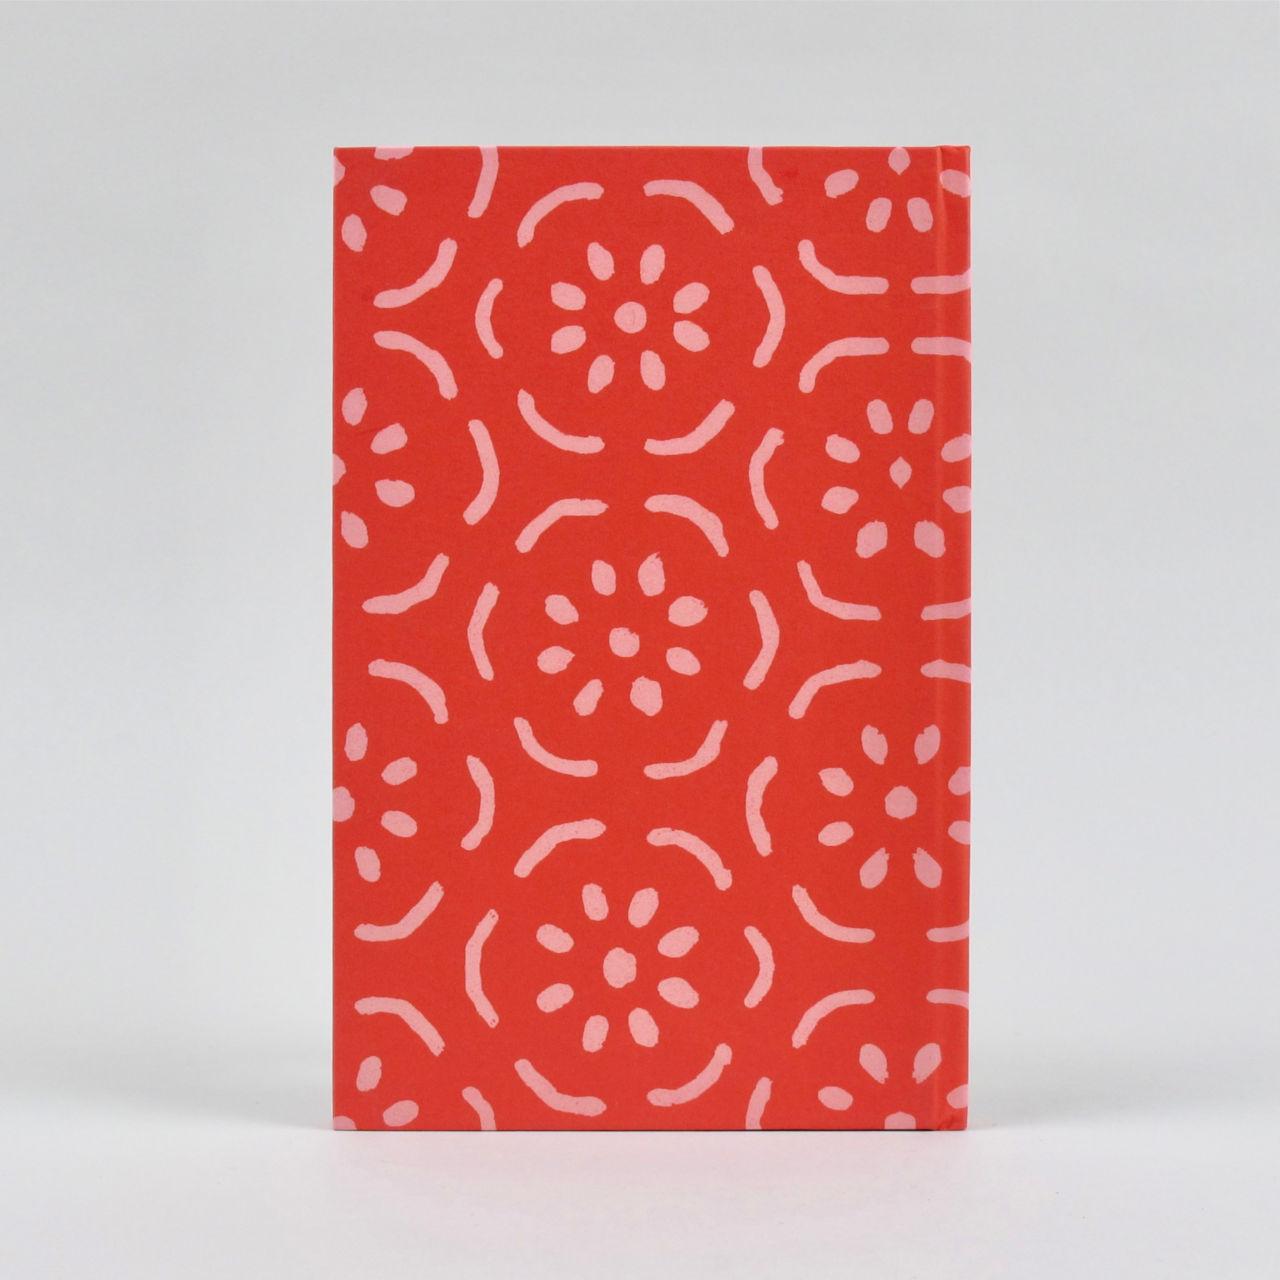 Hardback Notebook - Pear Halves